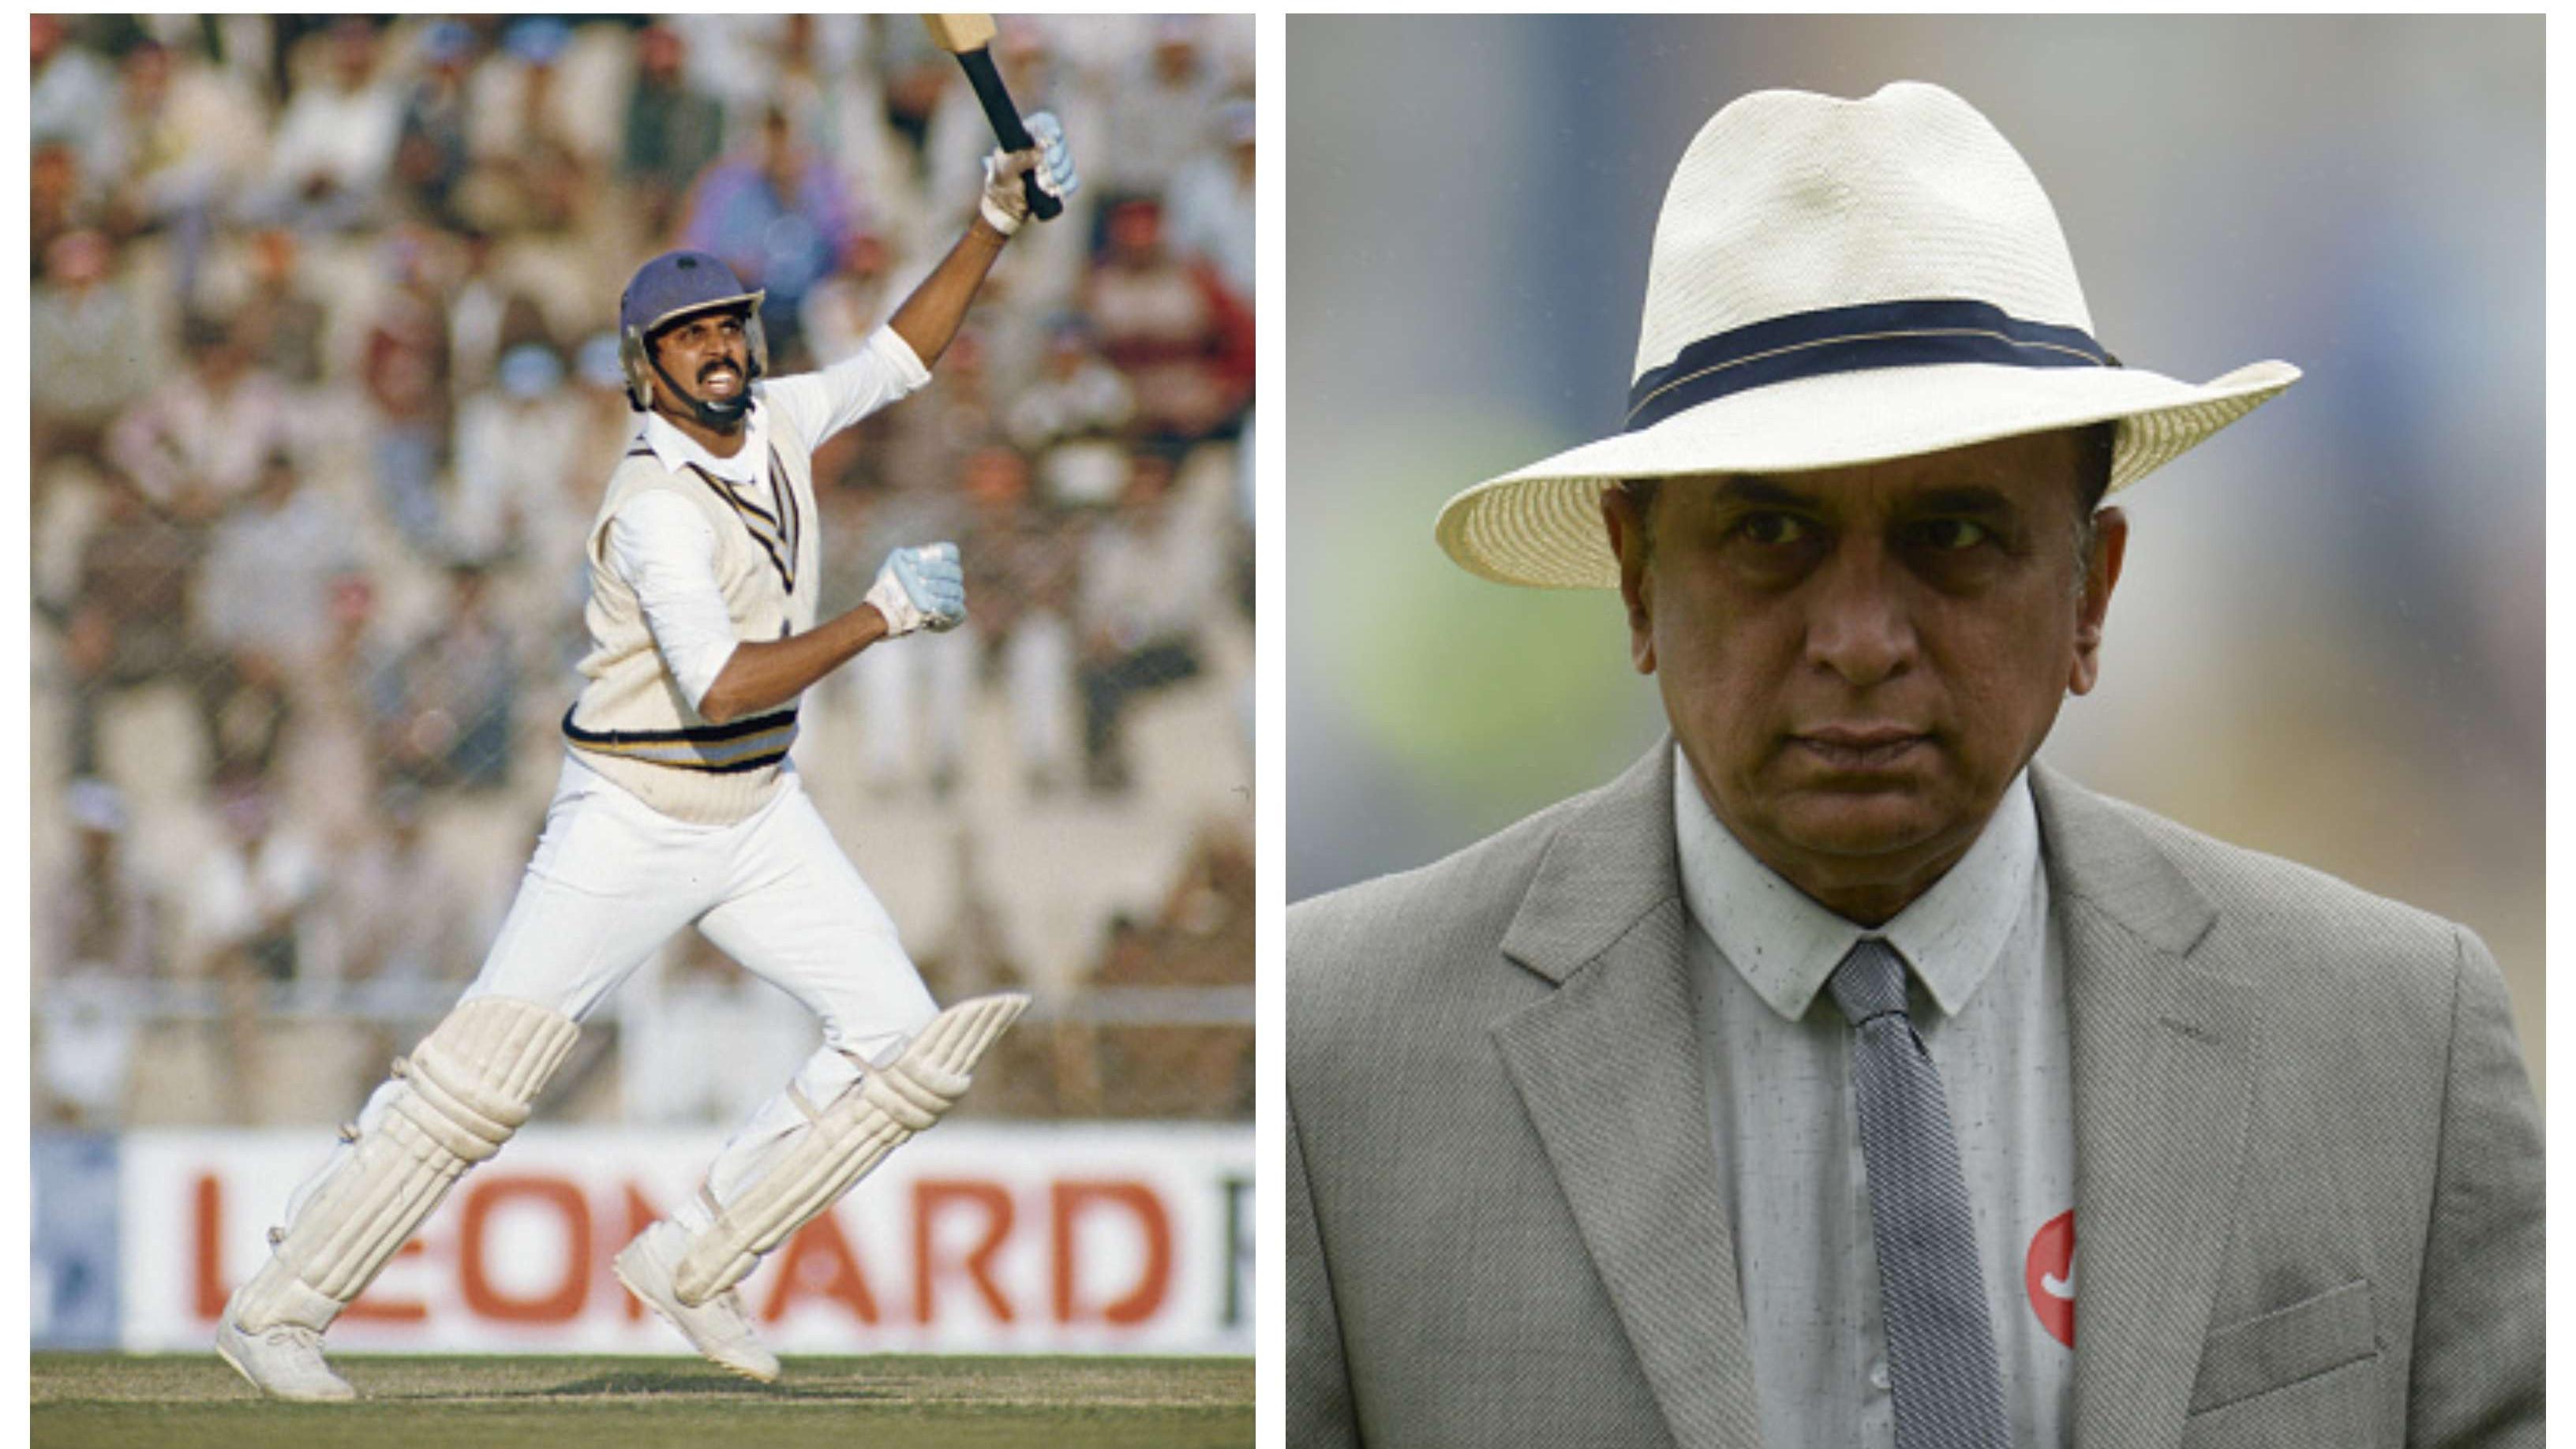 Sunil Gavaskar clears the air on Kapil Dev's exclusion from 1984 Kolkata Test against England